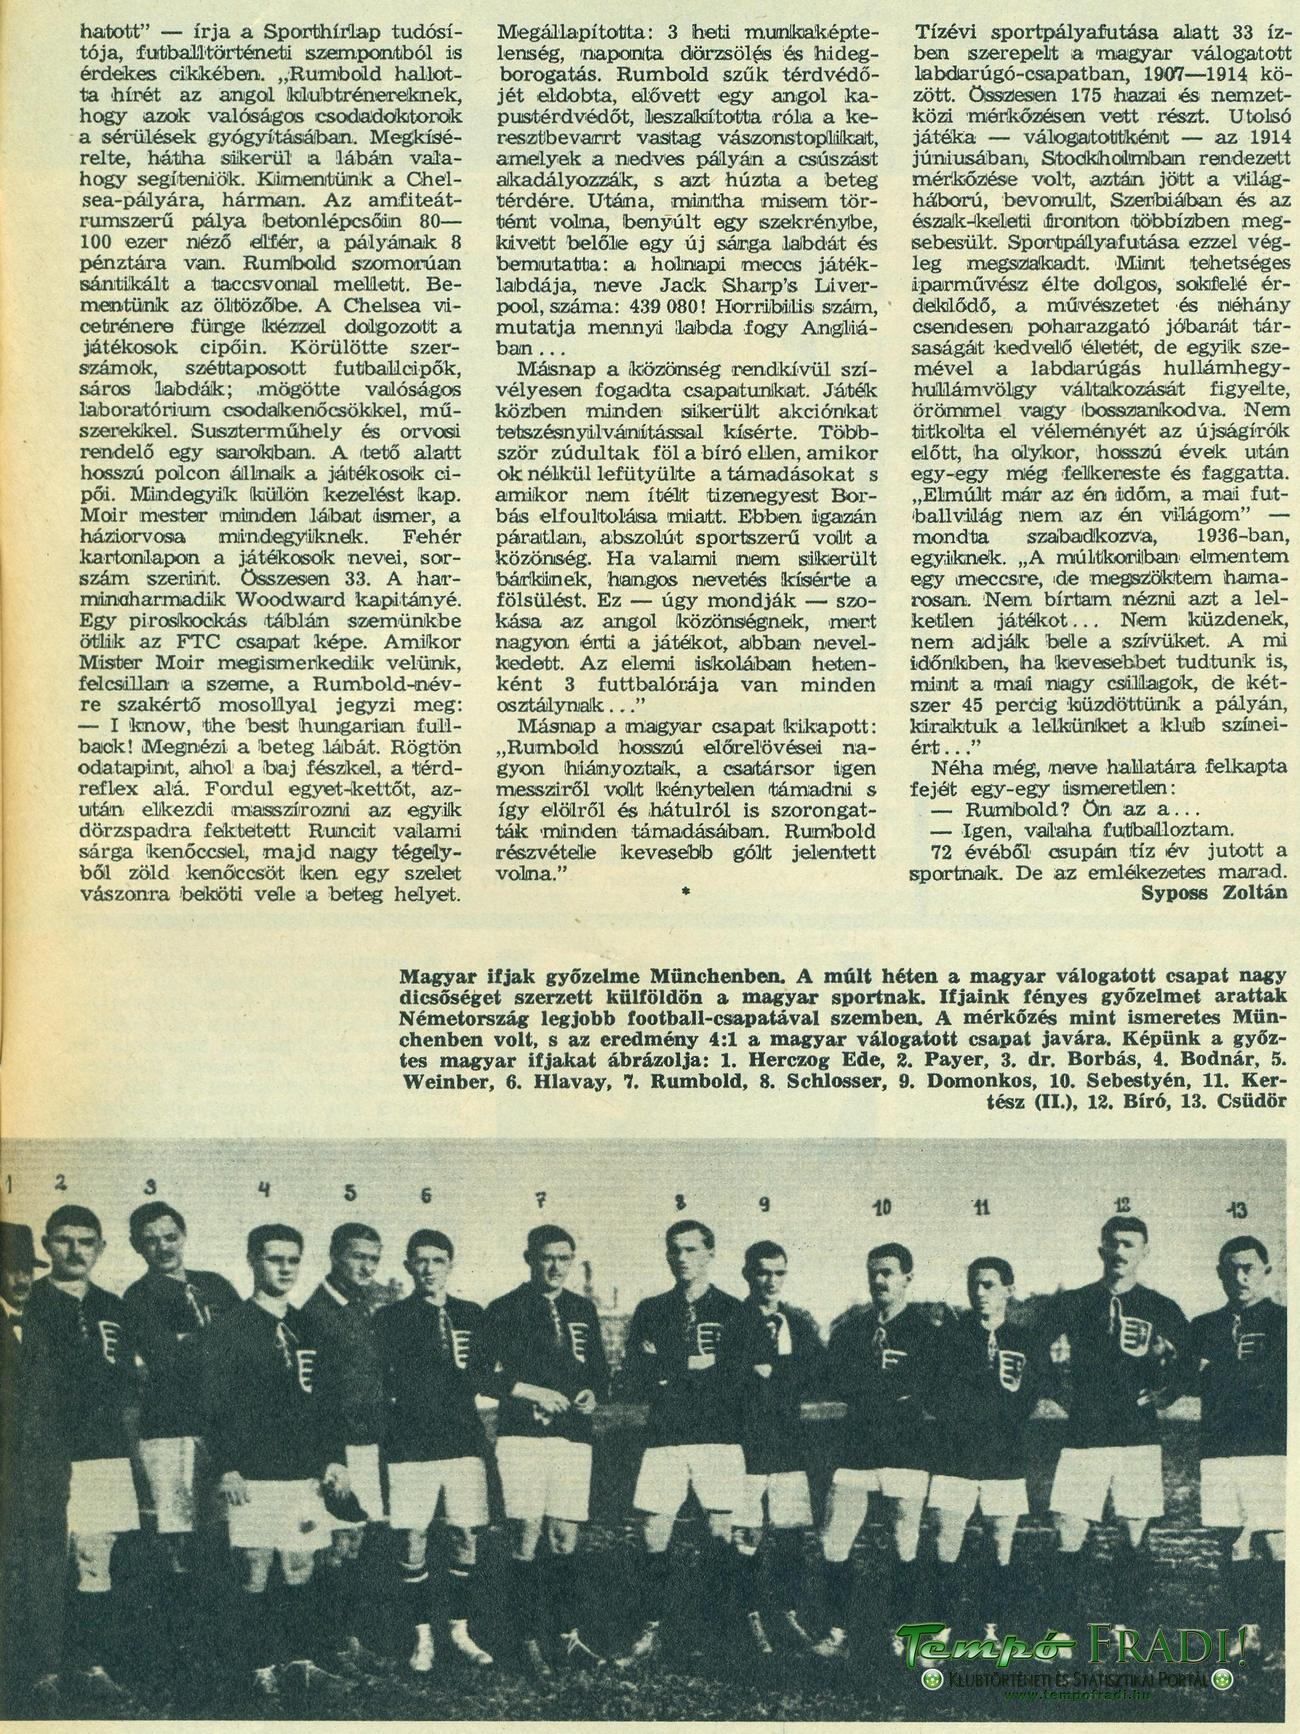 Sprtlt-1973-0042